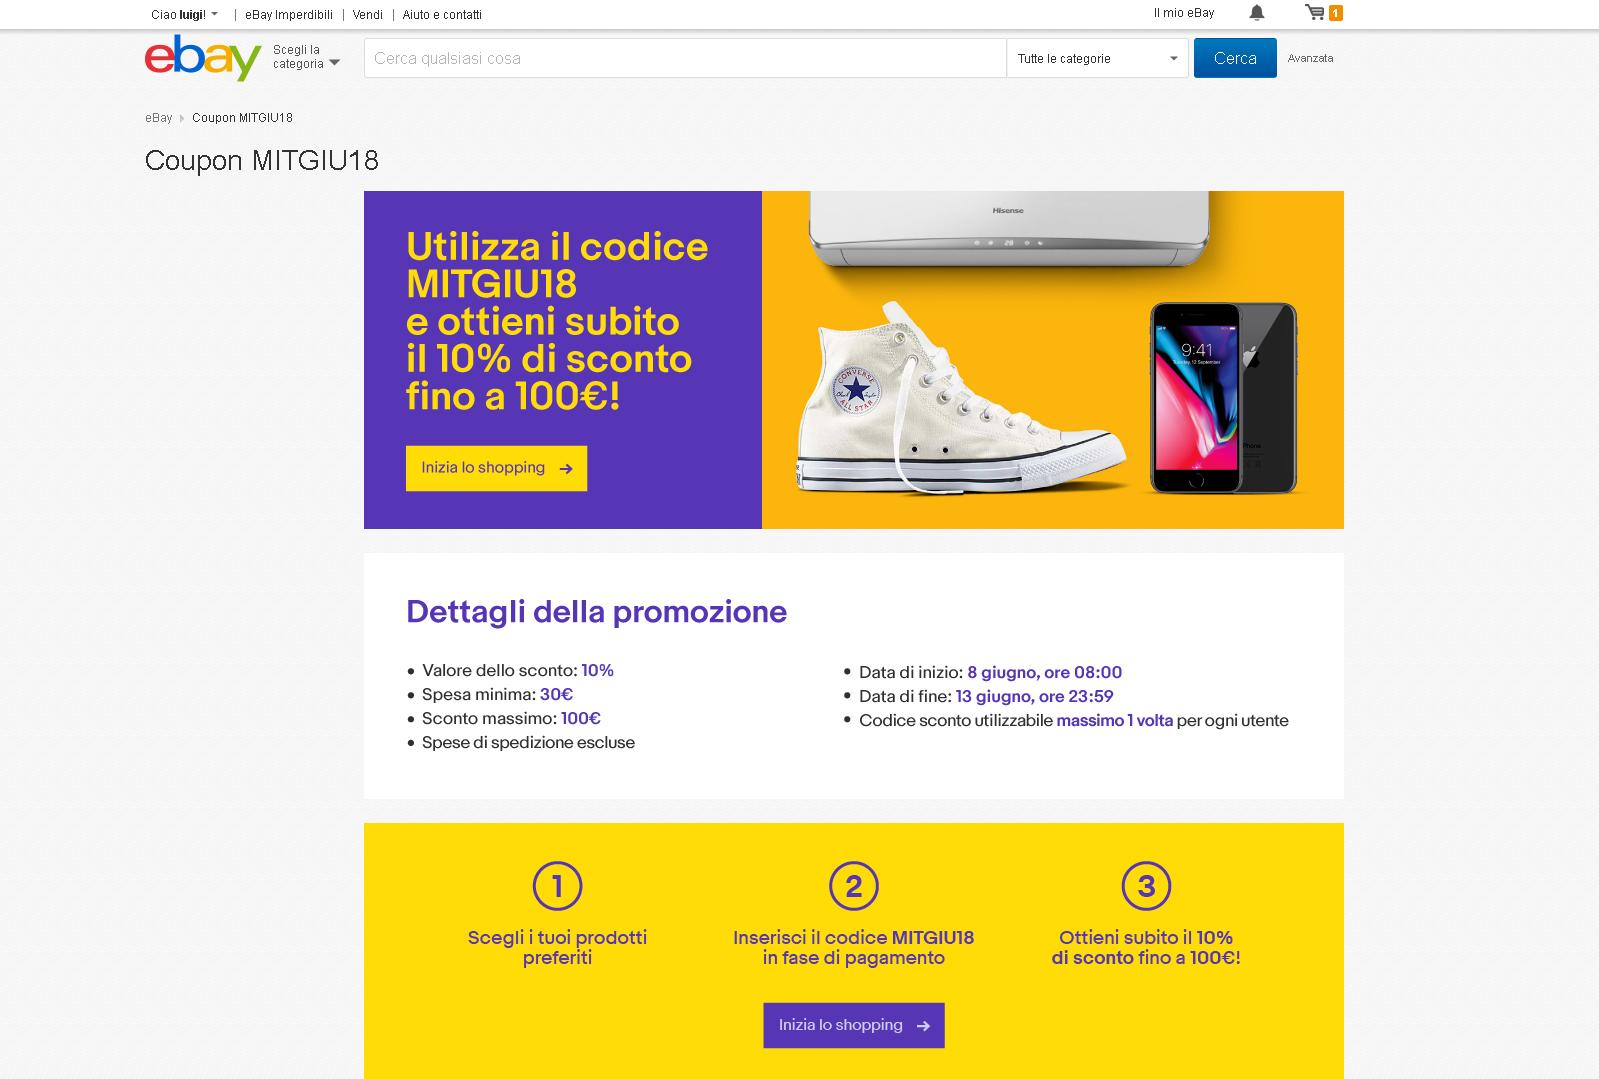 ebay coupon mitgiu18